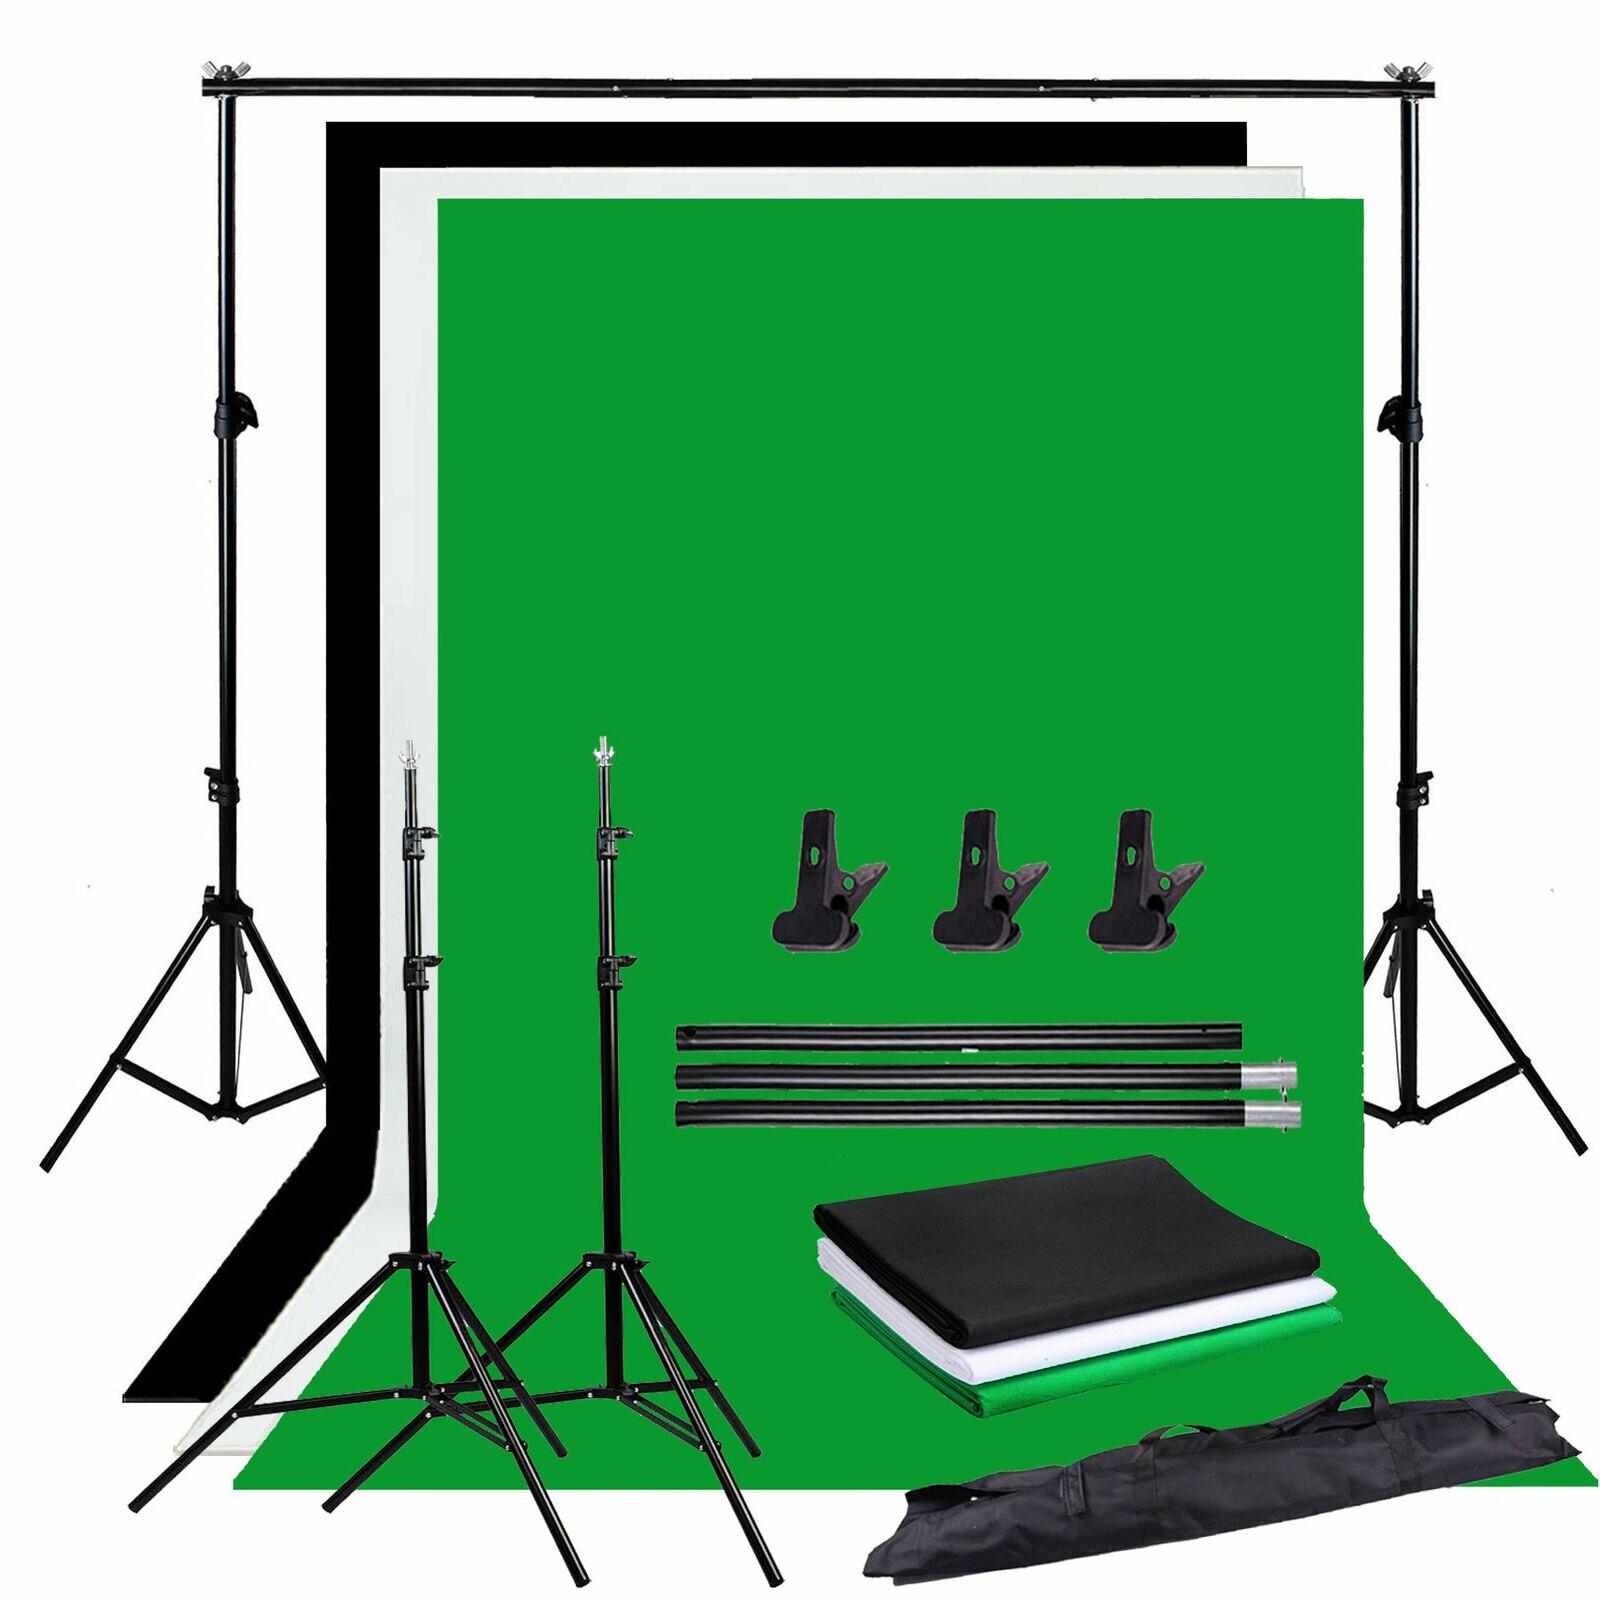 ZUOCHEN Photo Studio Backdrop Chroma Key Black White Green Screen Background Stand Kit With 2M Studio Backdrop Support Kit